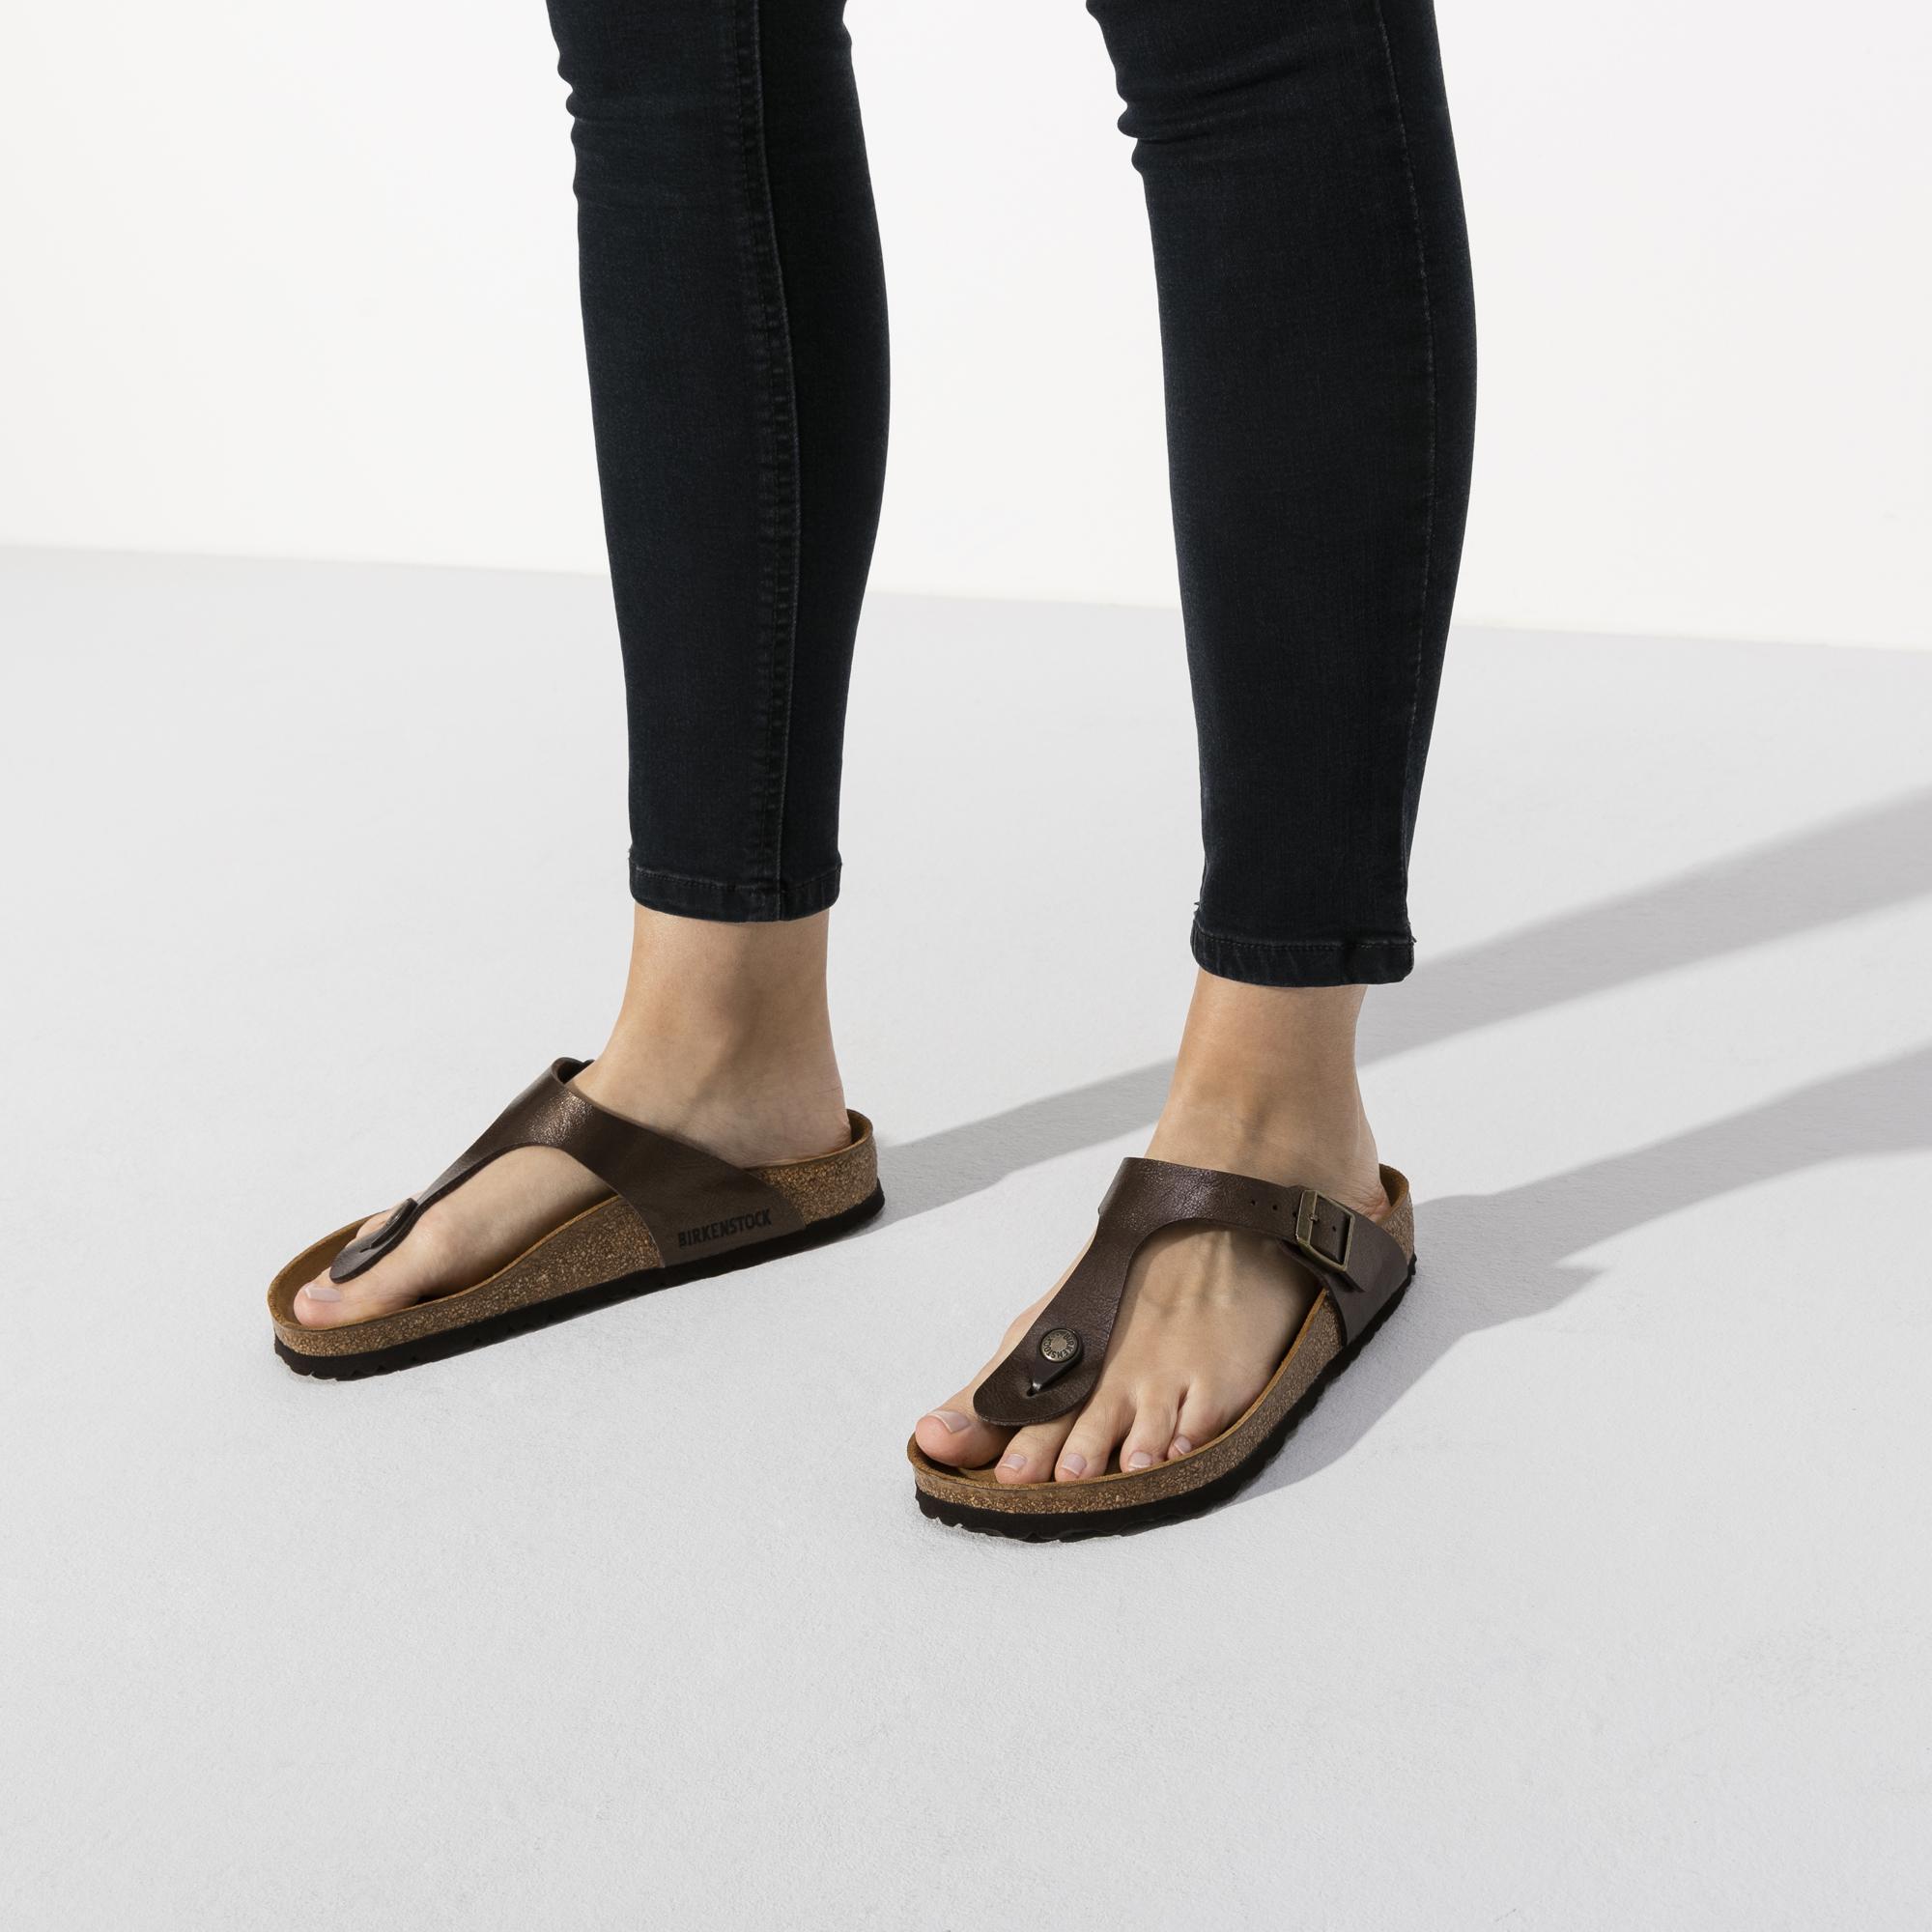 Birkenstock Gizeh Birko Flor Regular Shoes Females Footwear